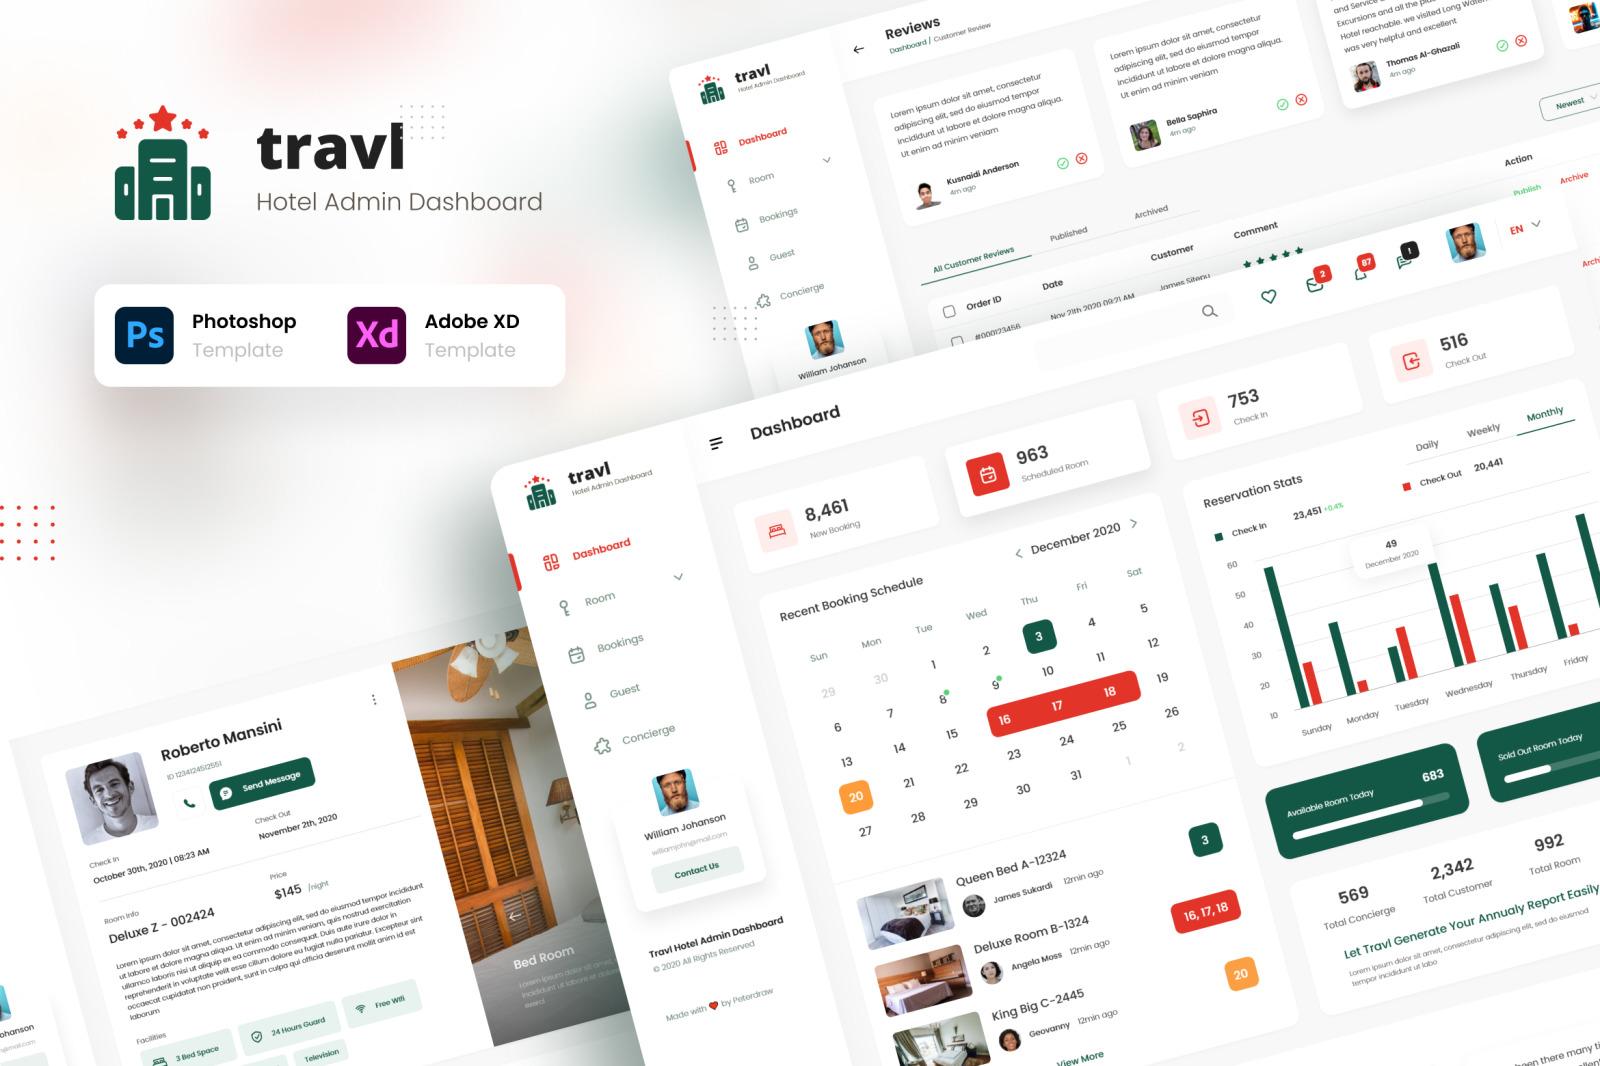 Travl - Hotel Admin Dashboard Adobe XD and PSD Template